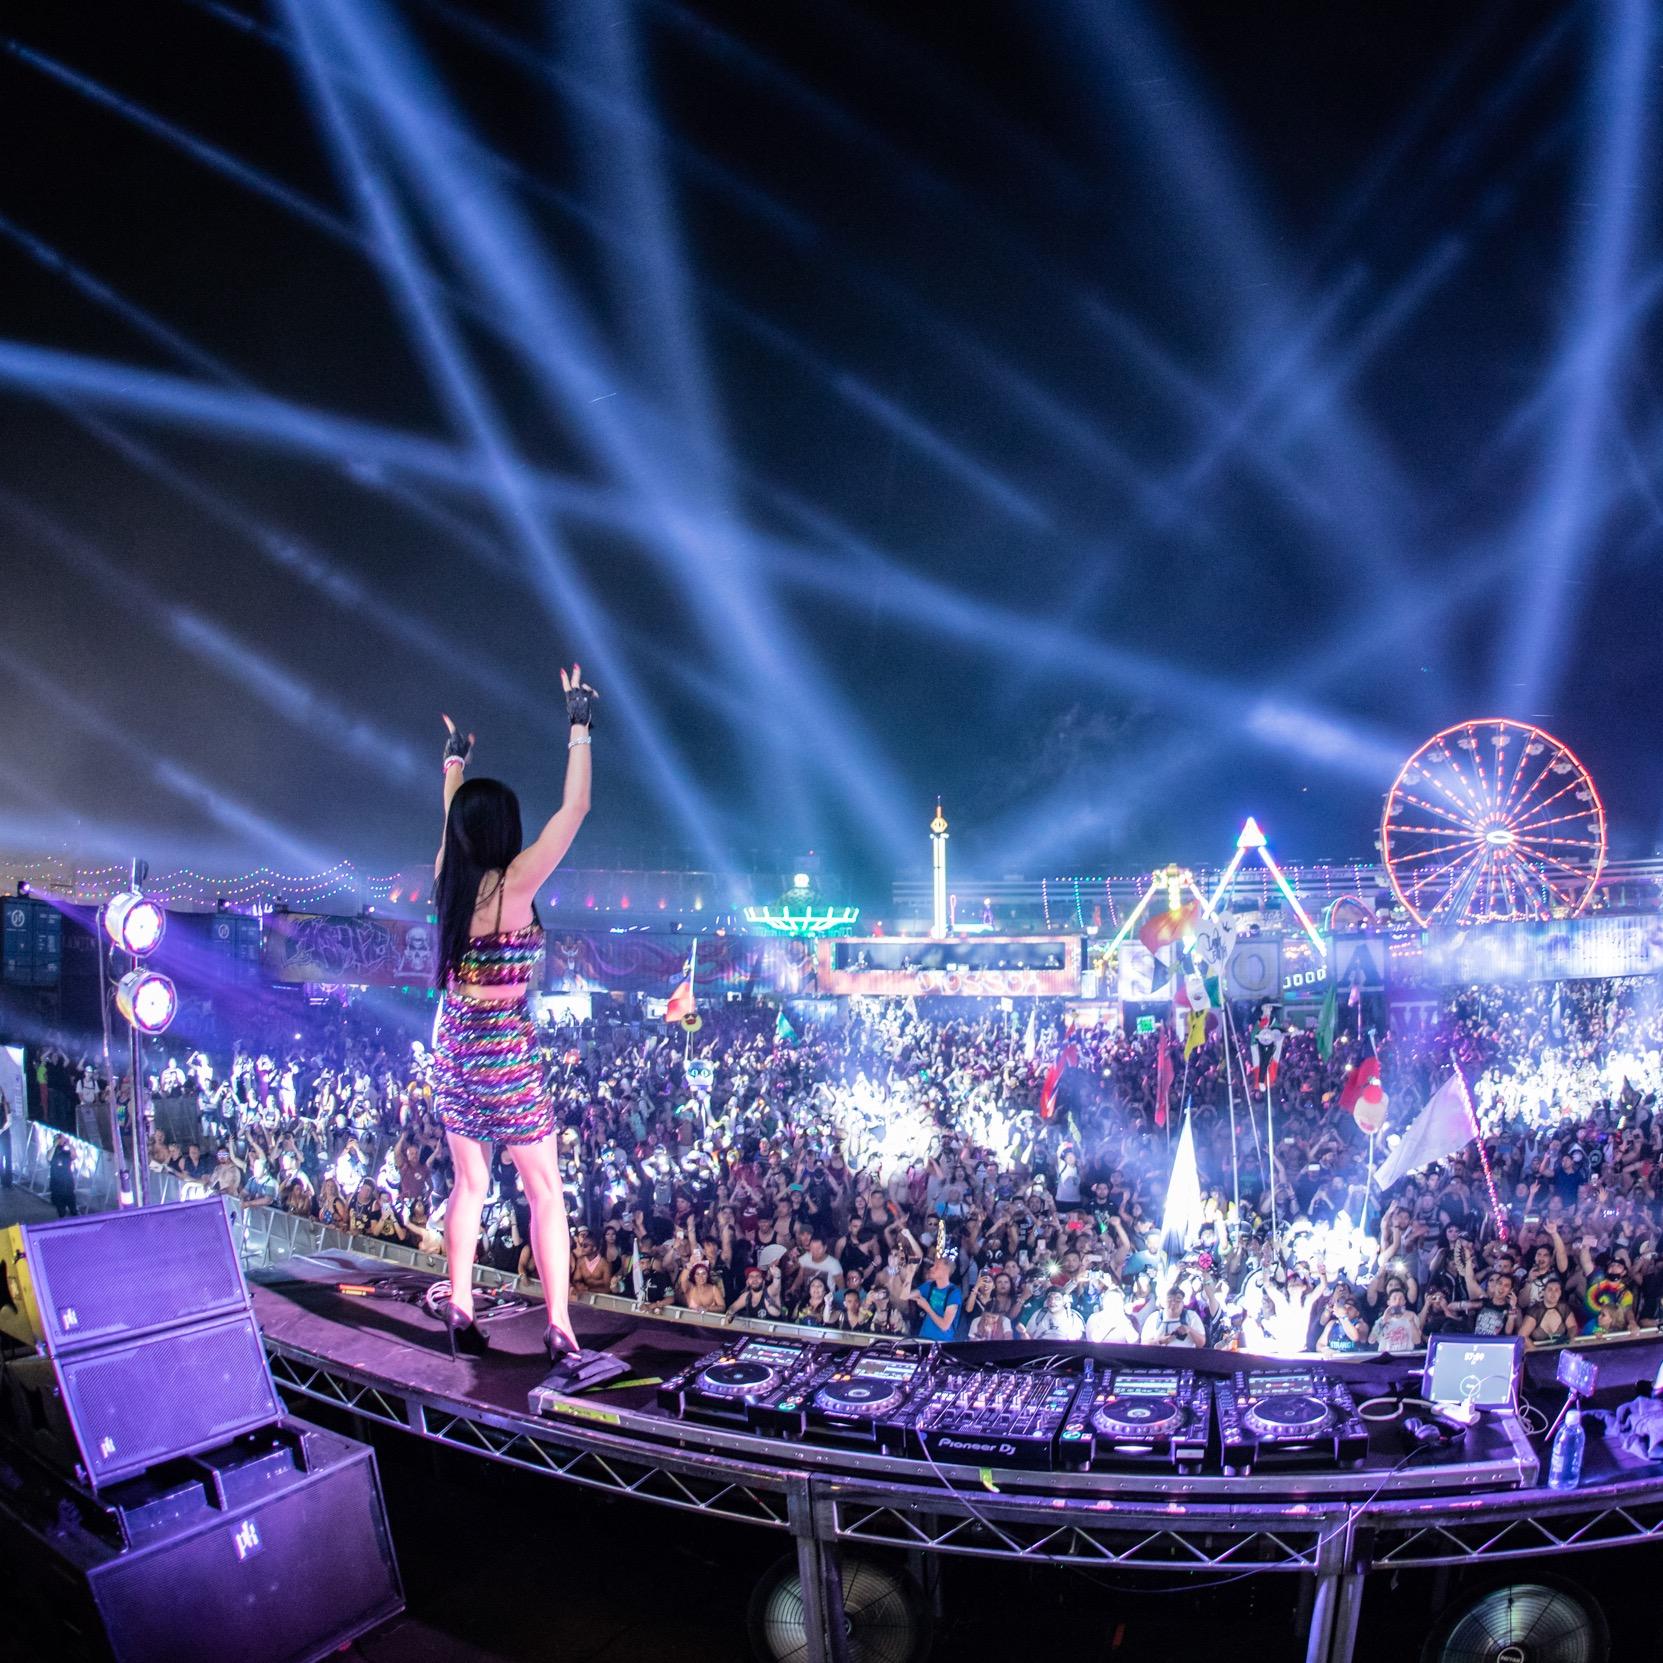 Lady Faith at EDC Las Vegas